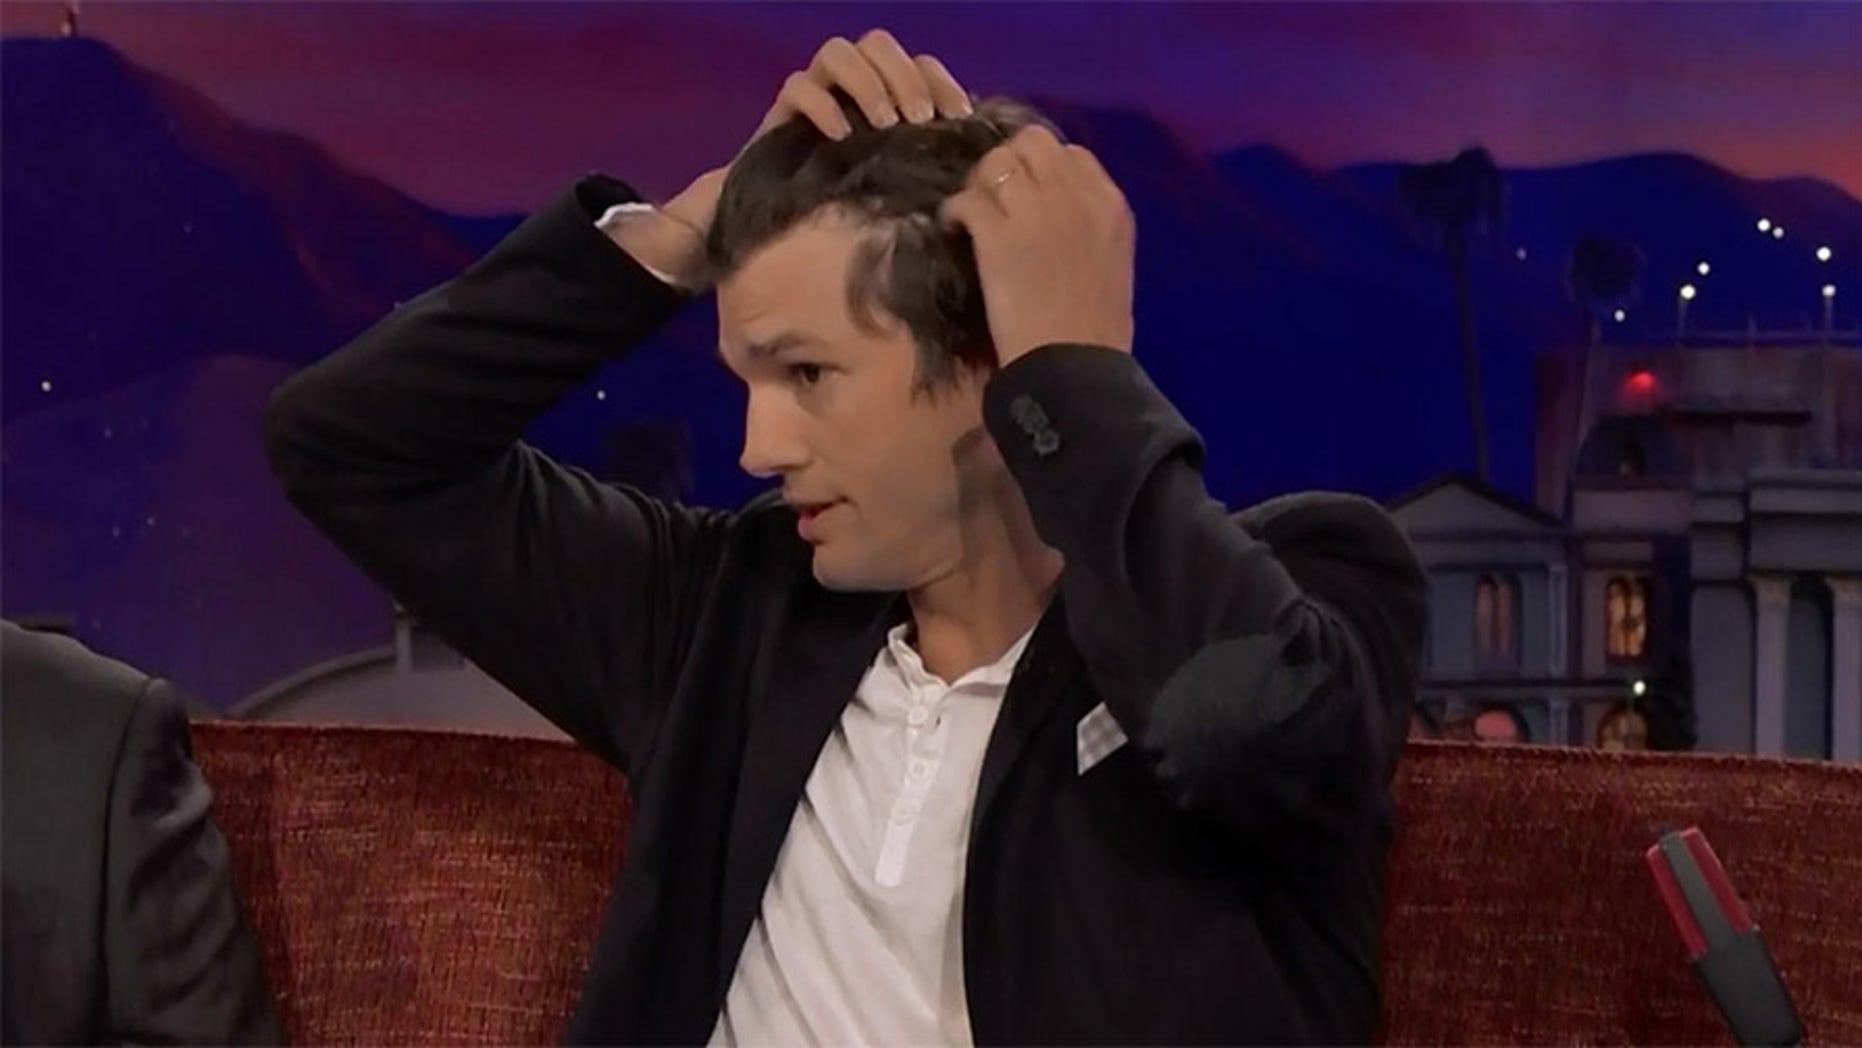 Ashton Kutcher revealed his receding hairline to TV host Conan O'Brien Monday night.